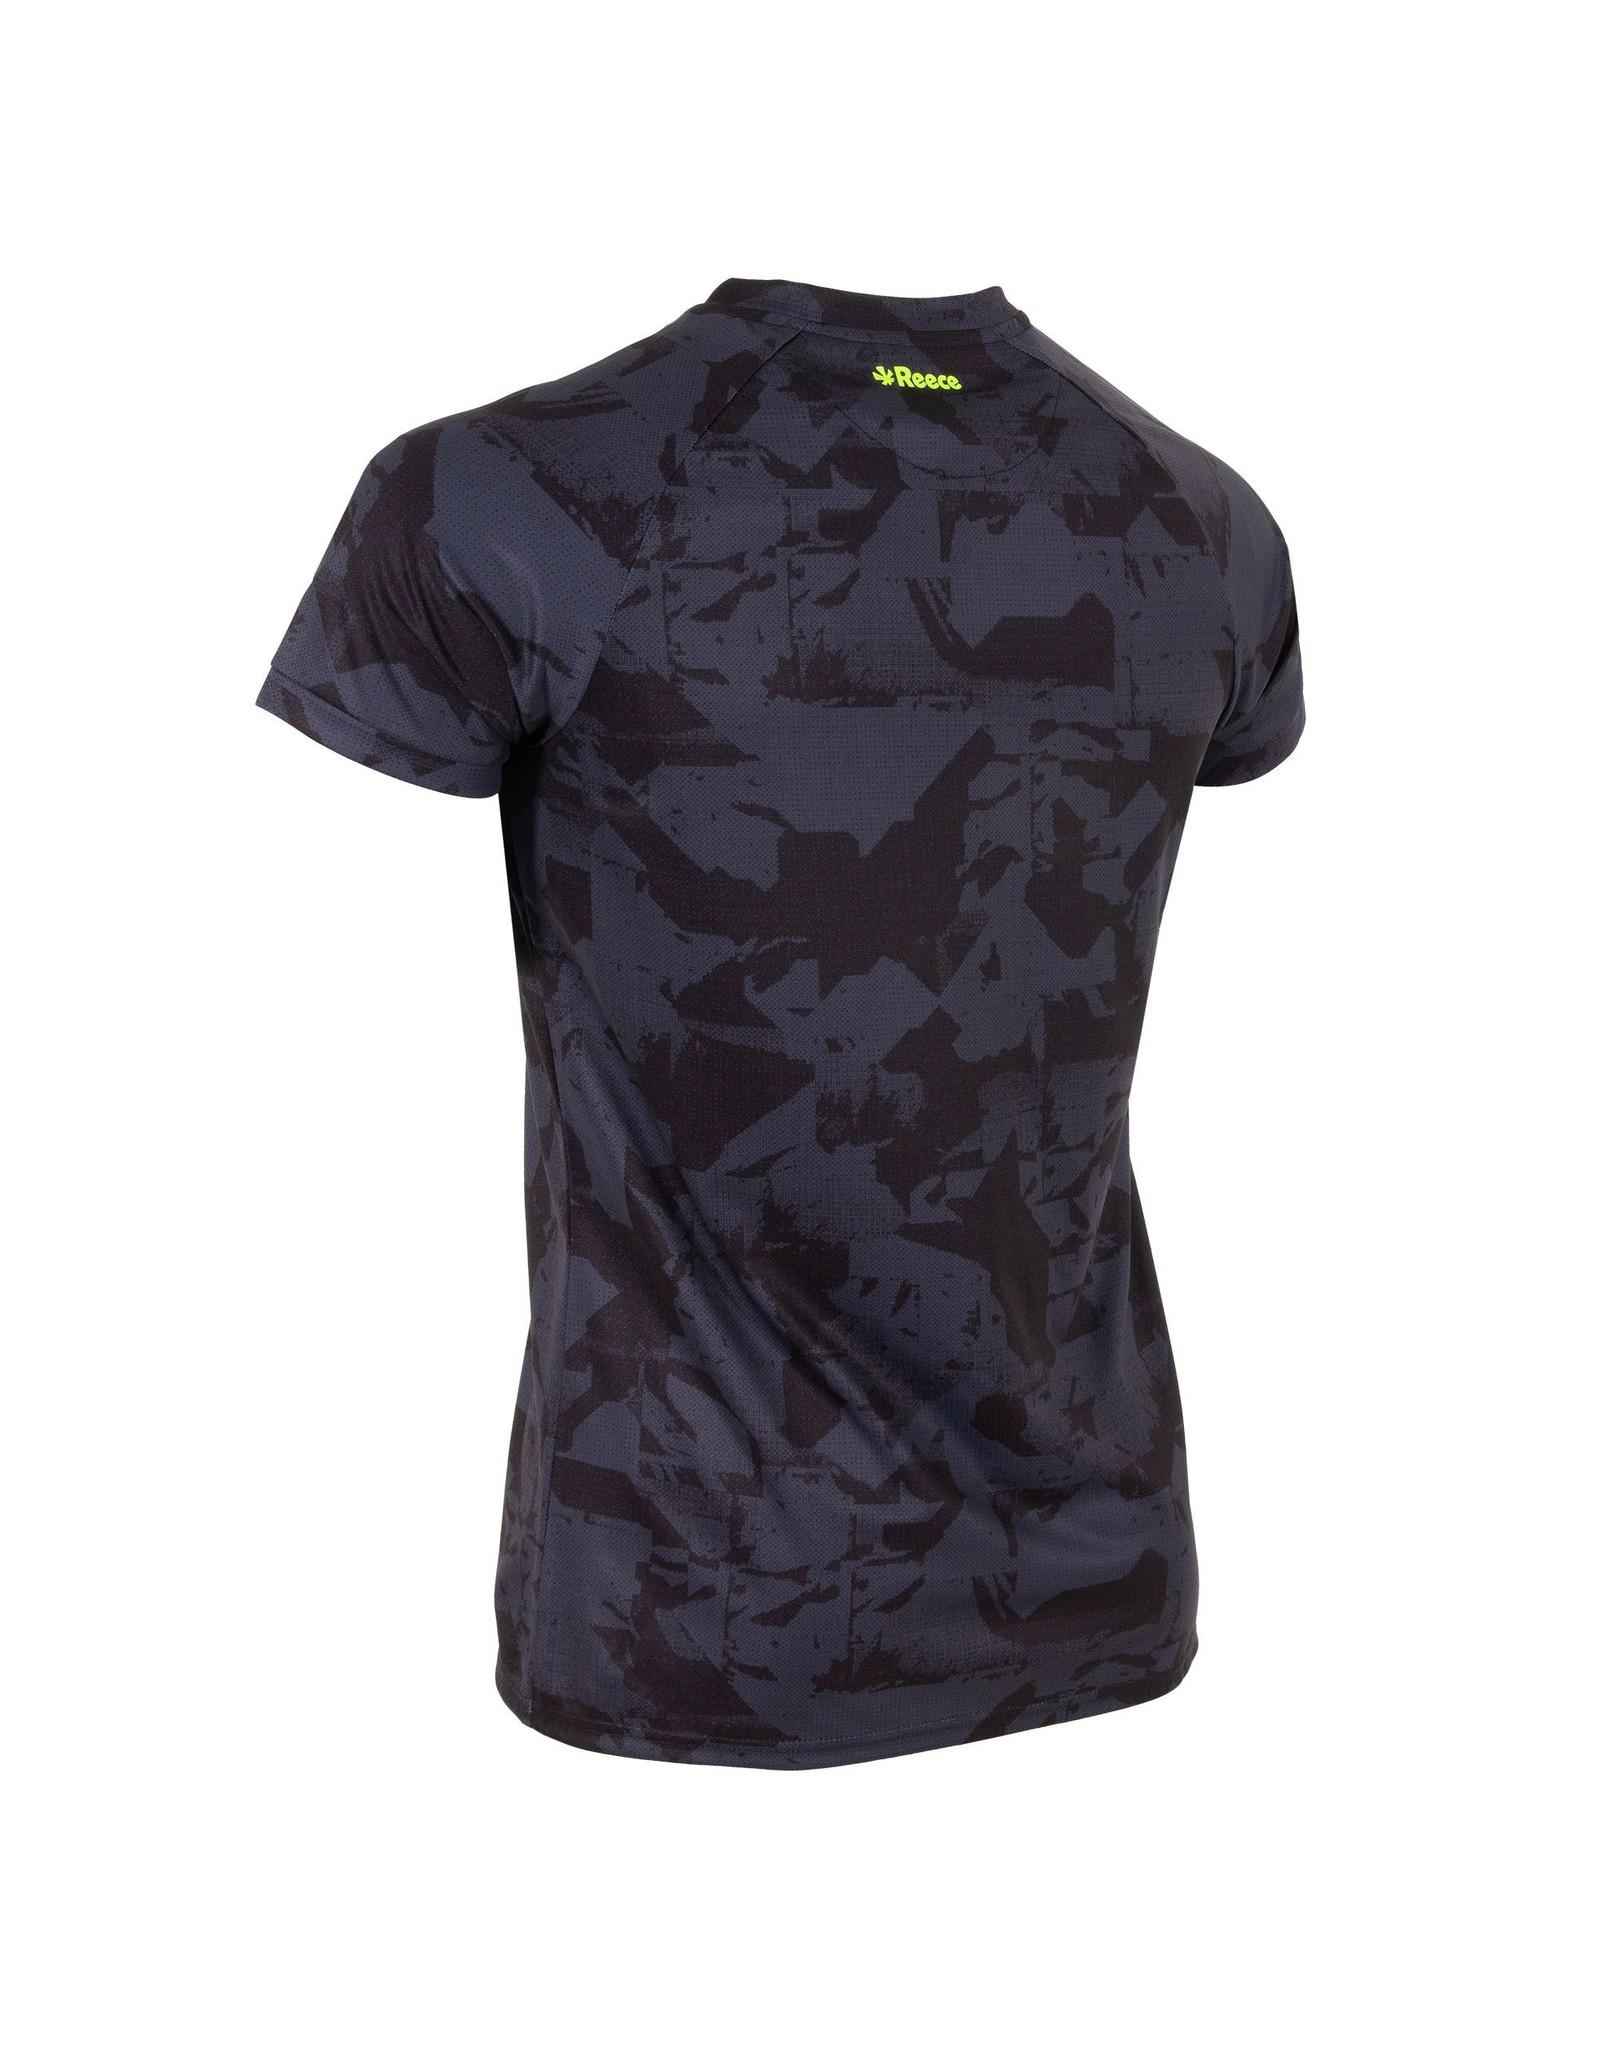 Reece Australia Smithfield Shirt Limited Unisex-Grijs